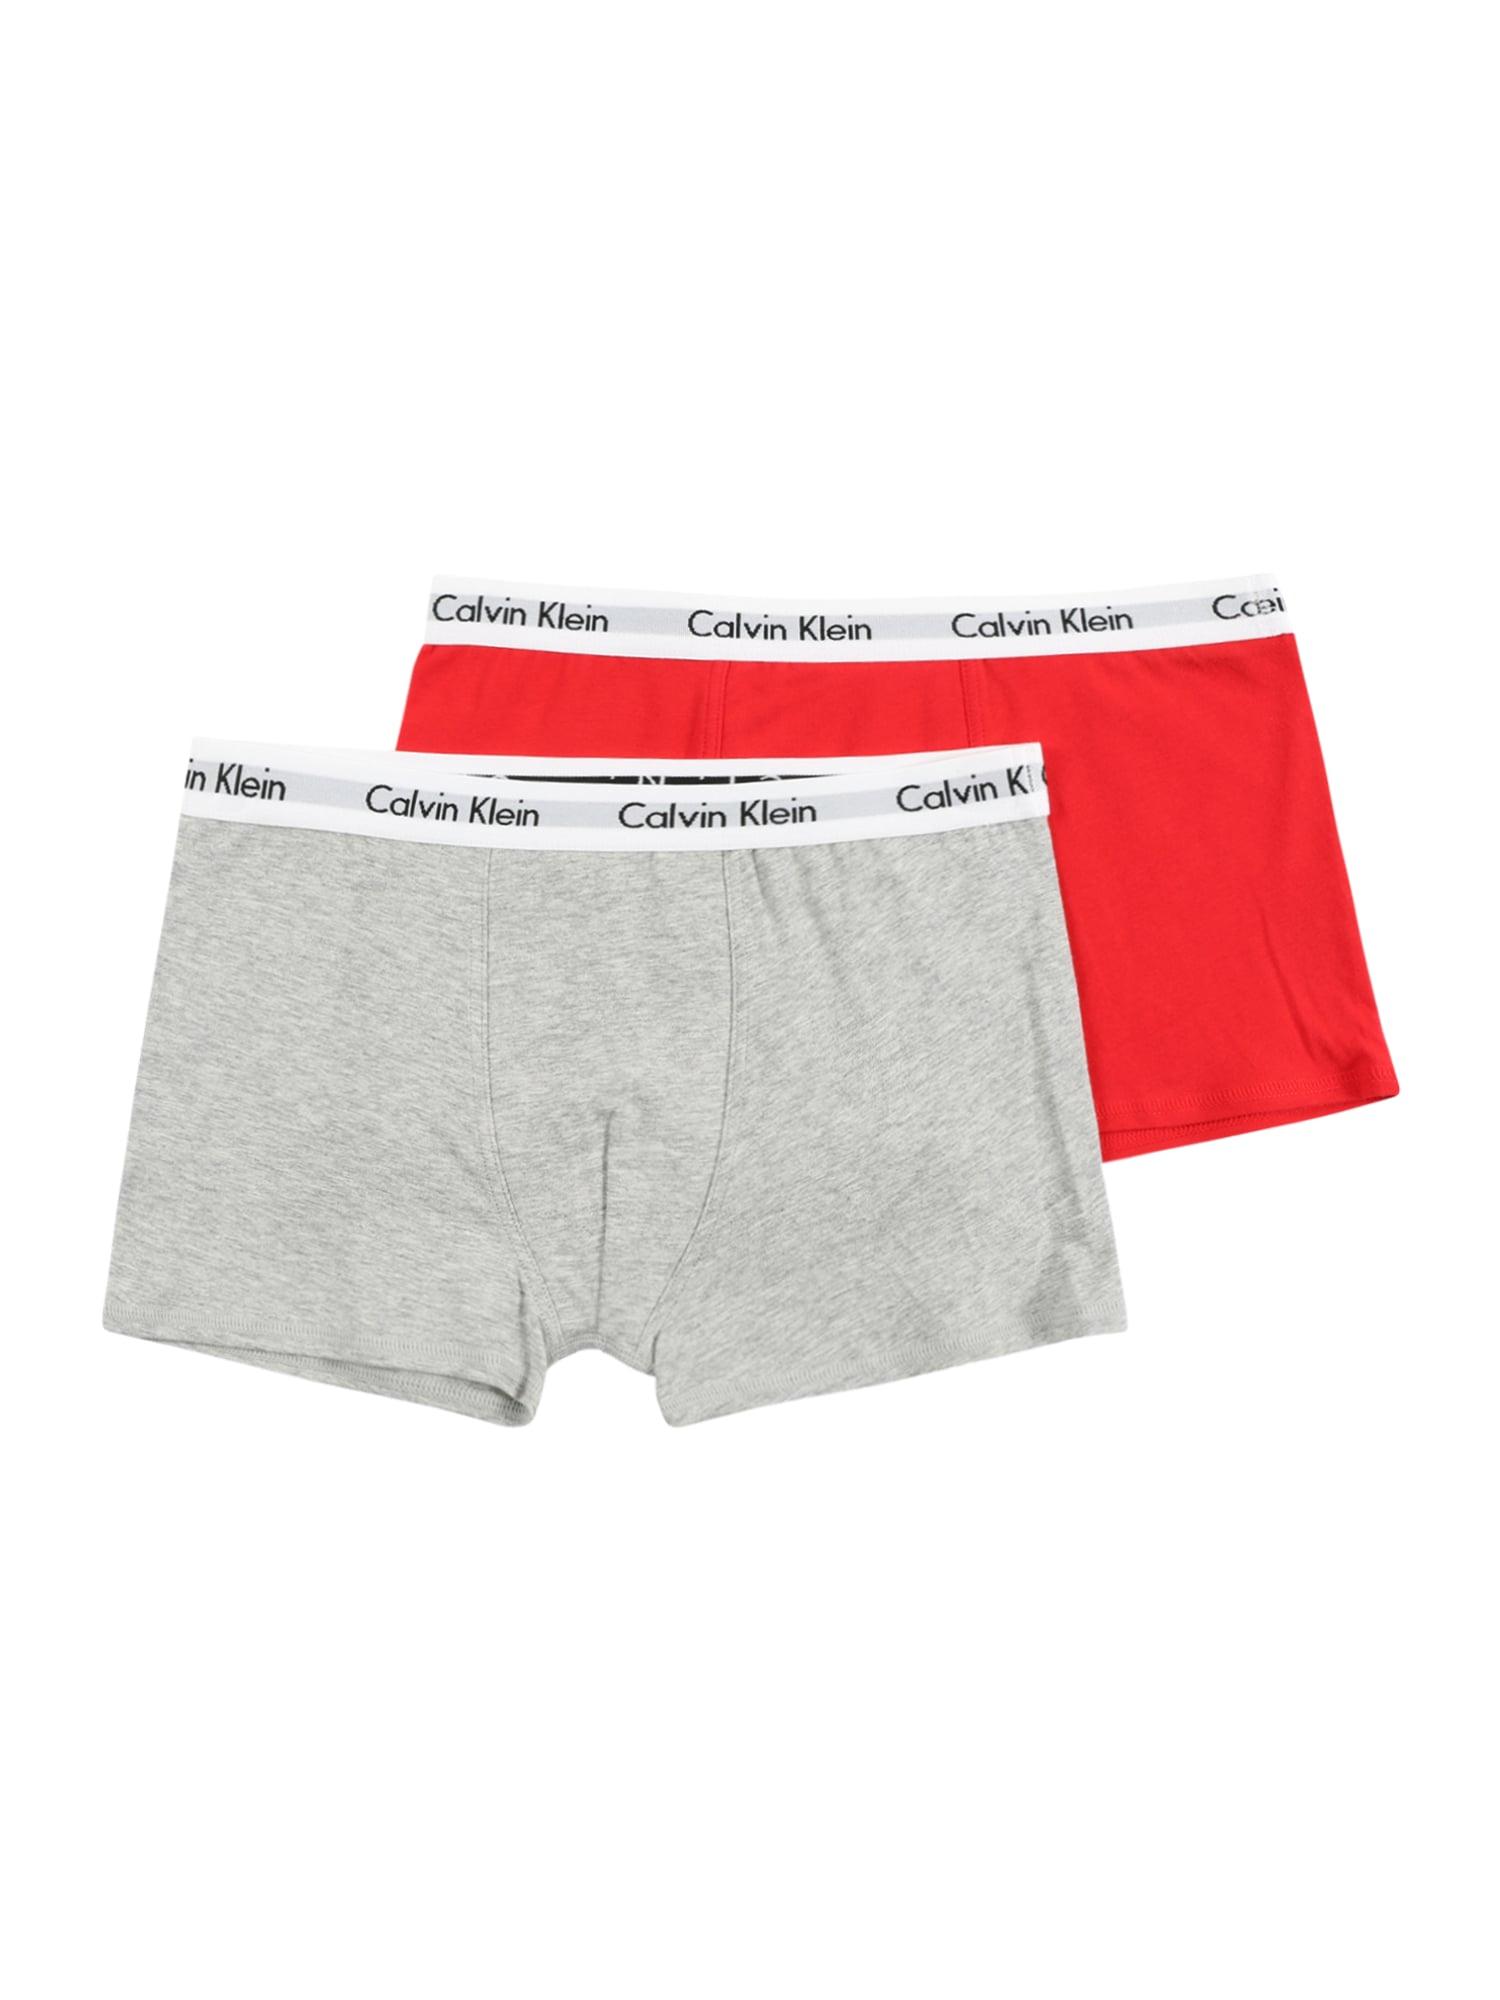 Calvin Klein Underwear Apatinės kelnaitės margai pilka / raudona / balta / juoda